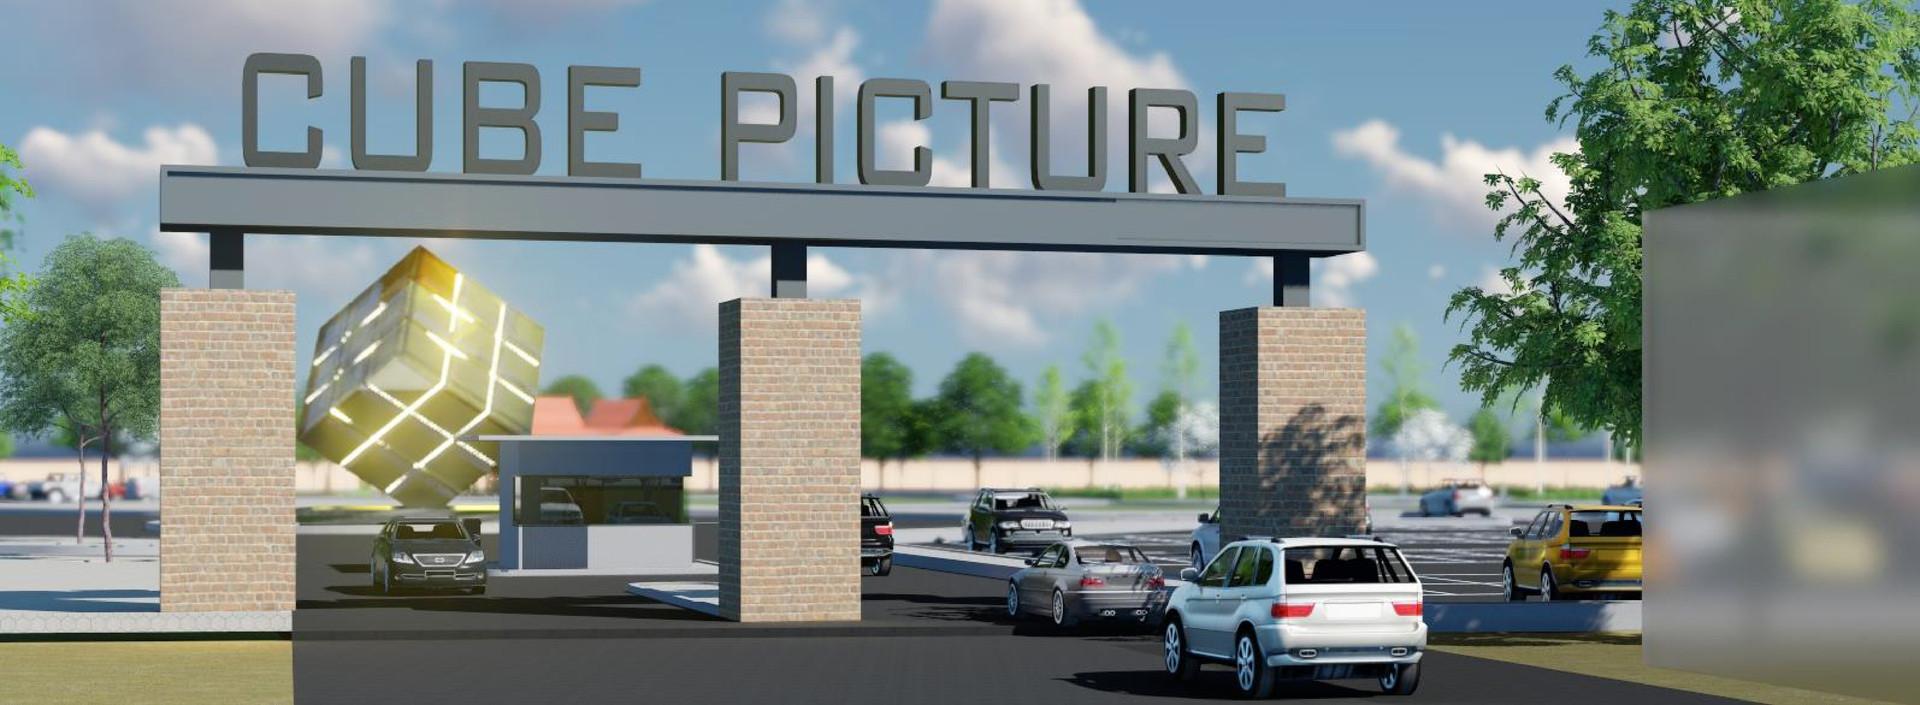 3D VIEW-01.jpg